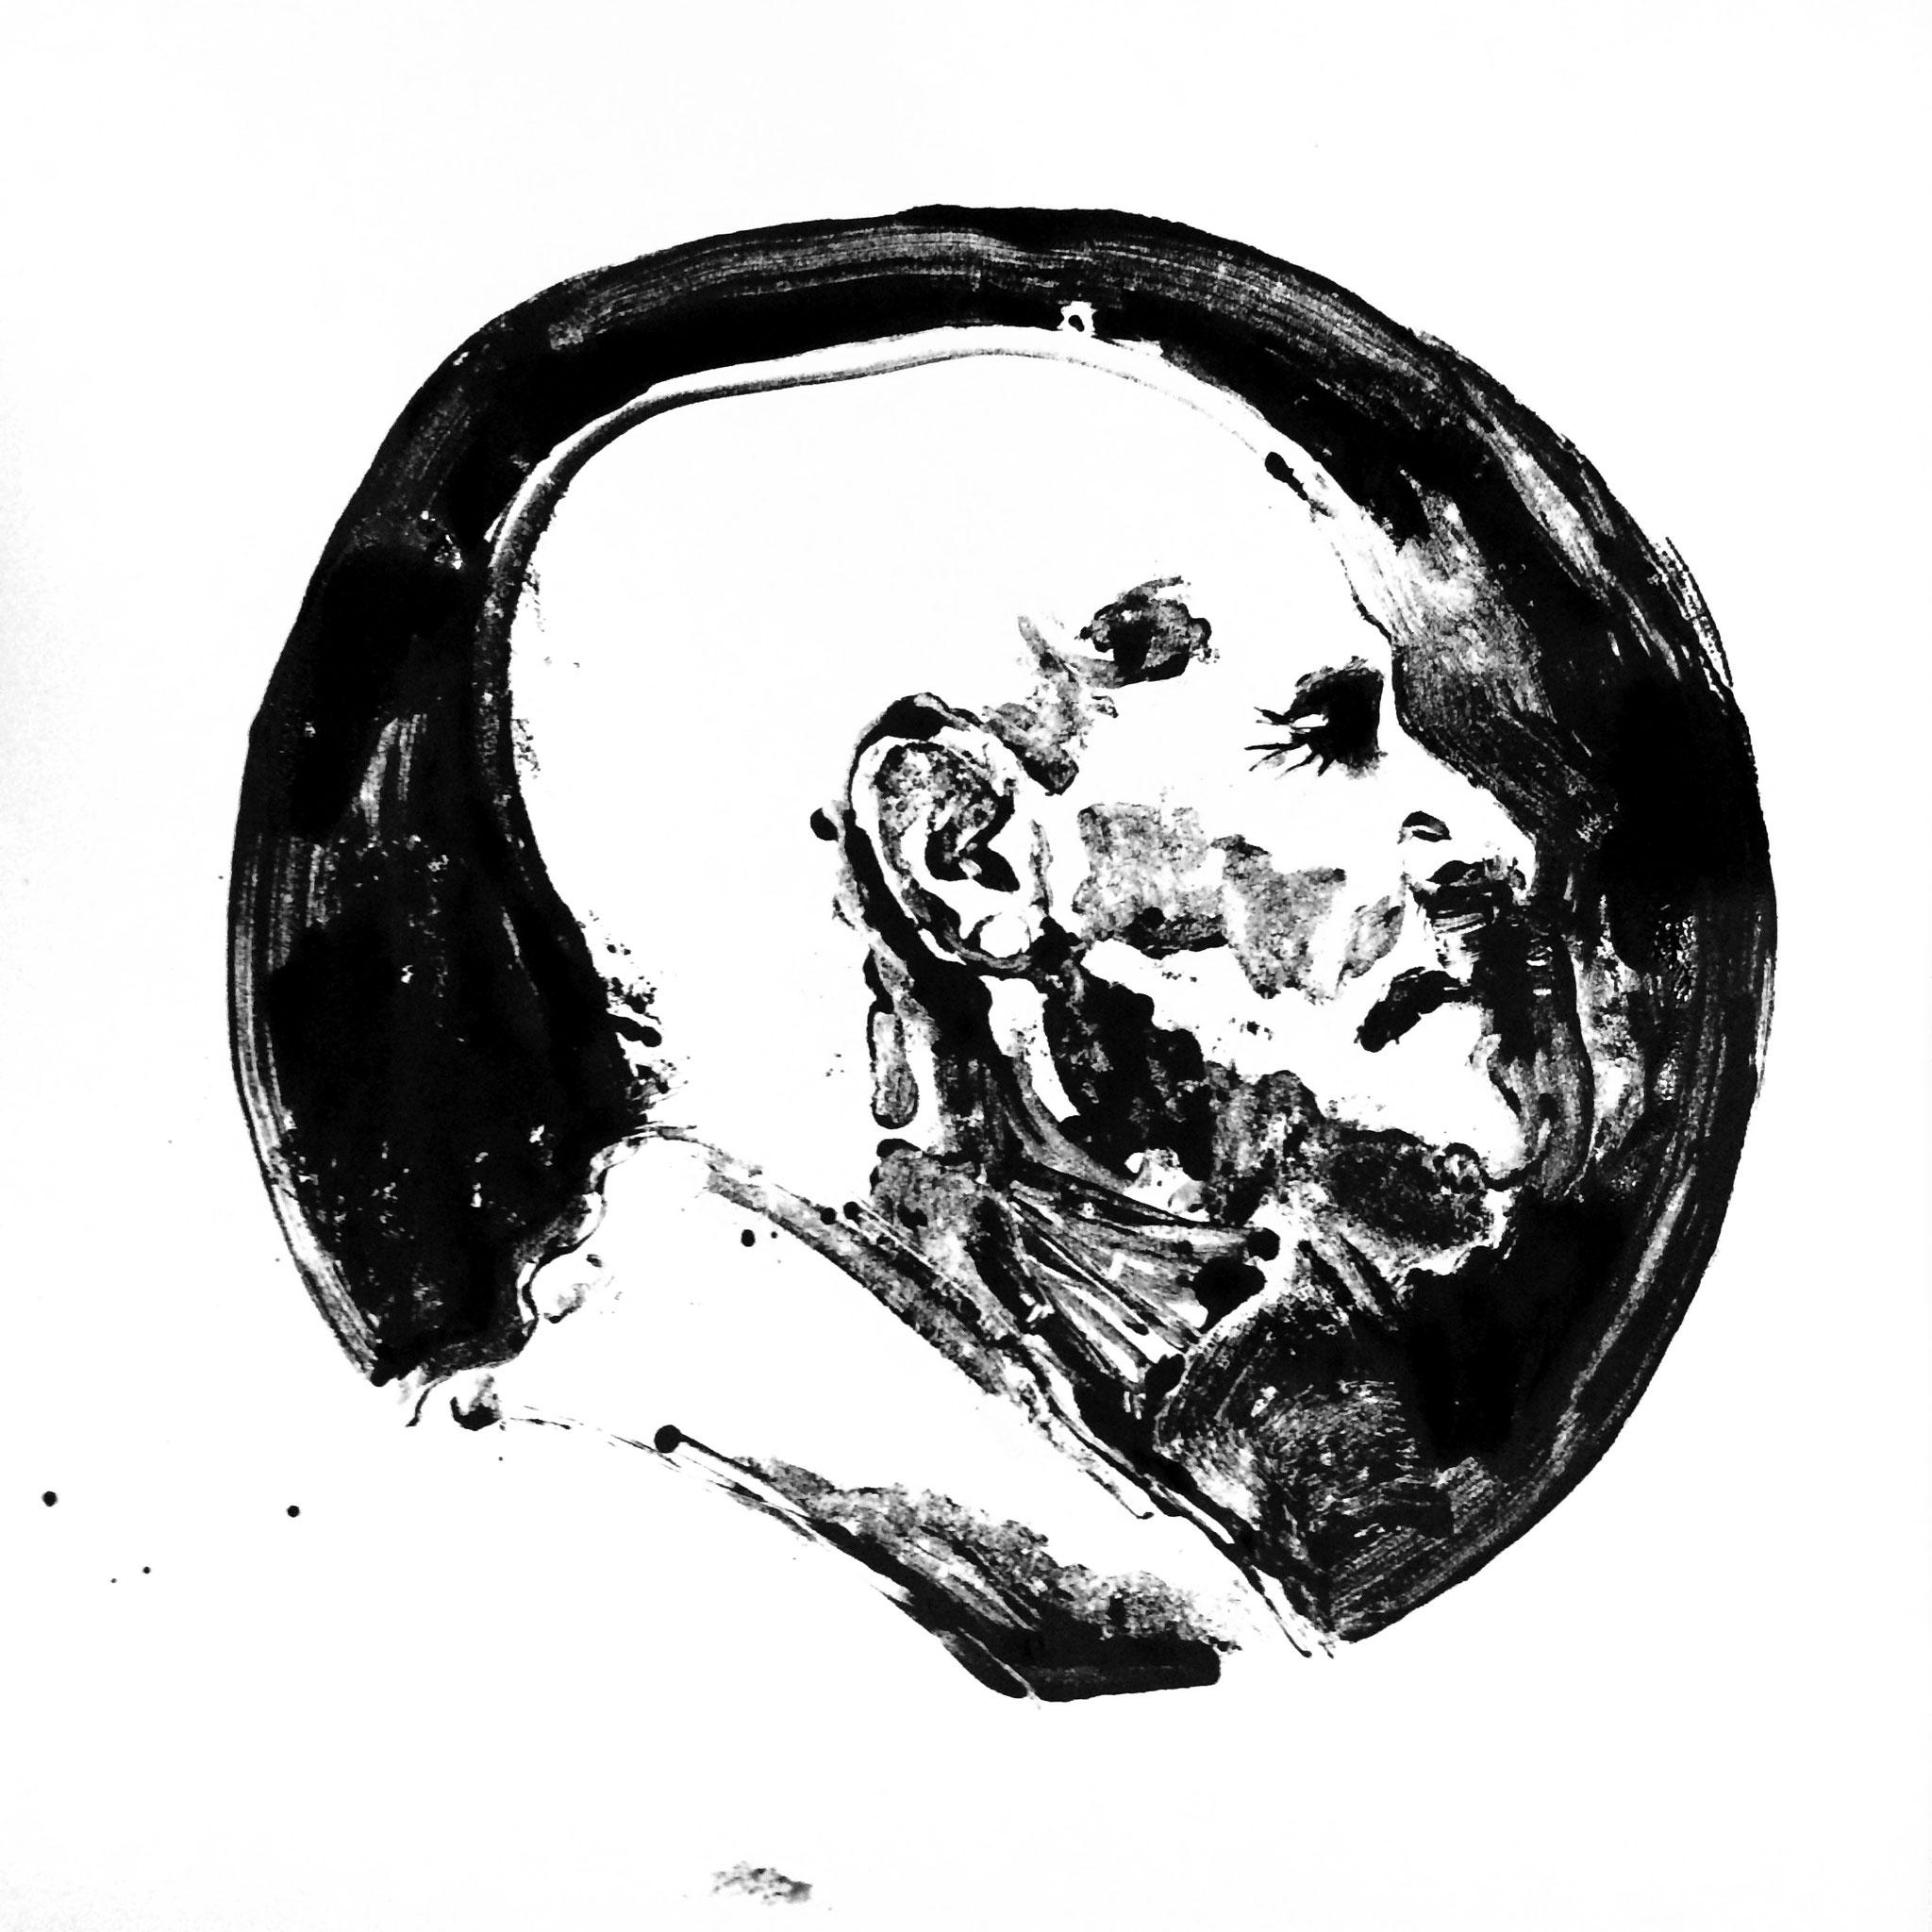 Elyseum, 80 x 80 cm, ink on paper